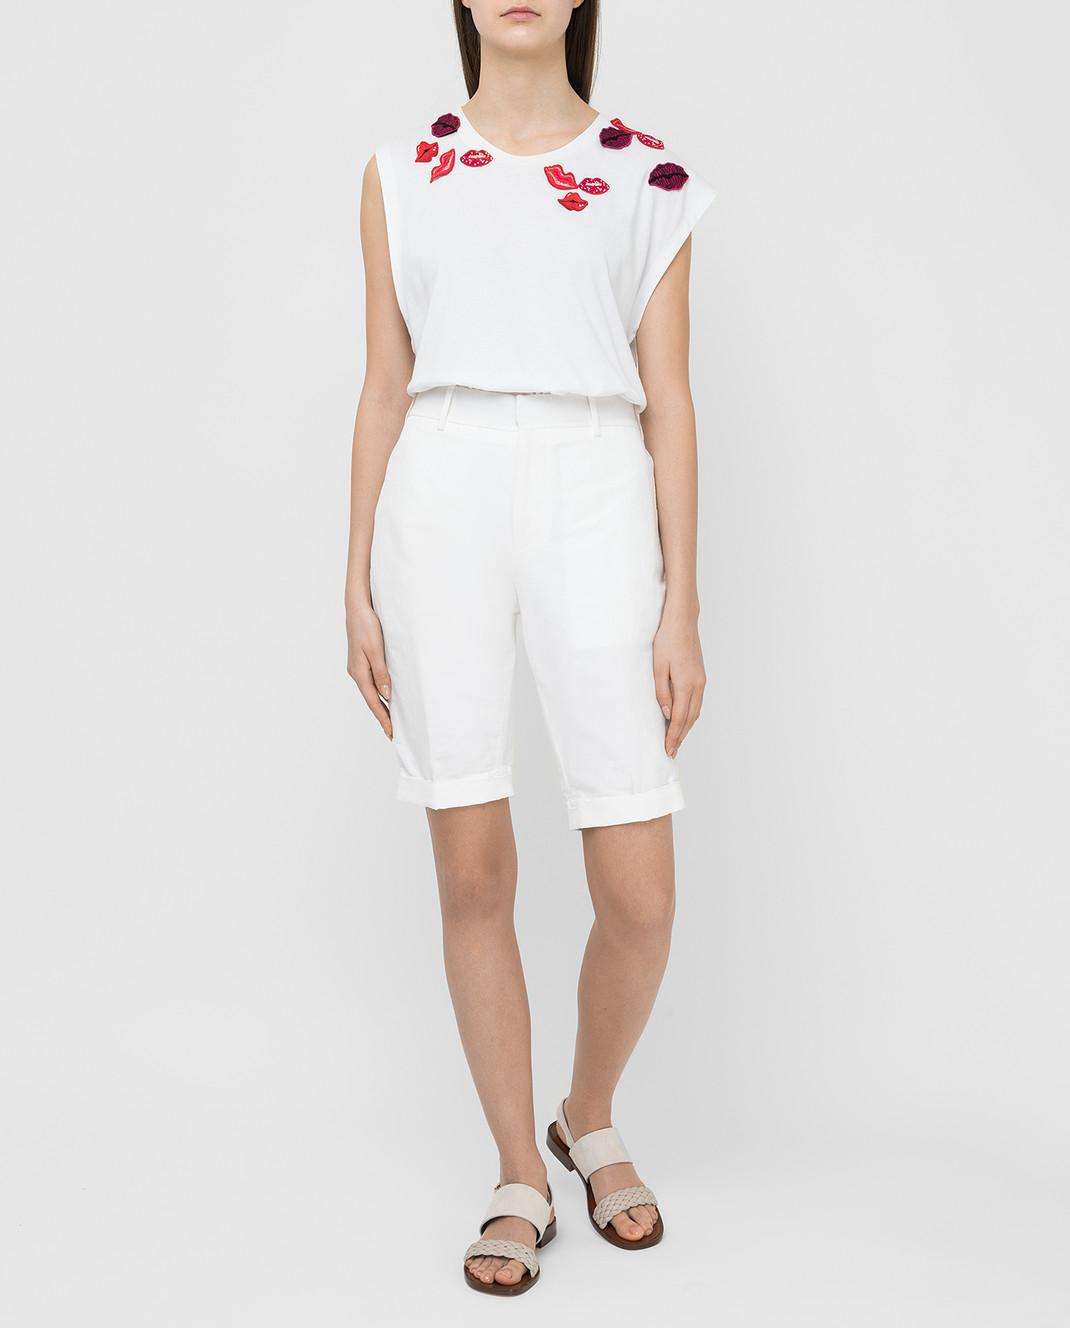 Marni Белые шорты PAMAN47A10TL234 изображение 2